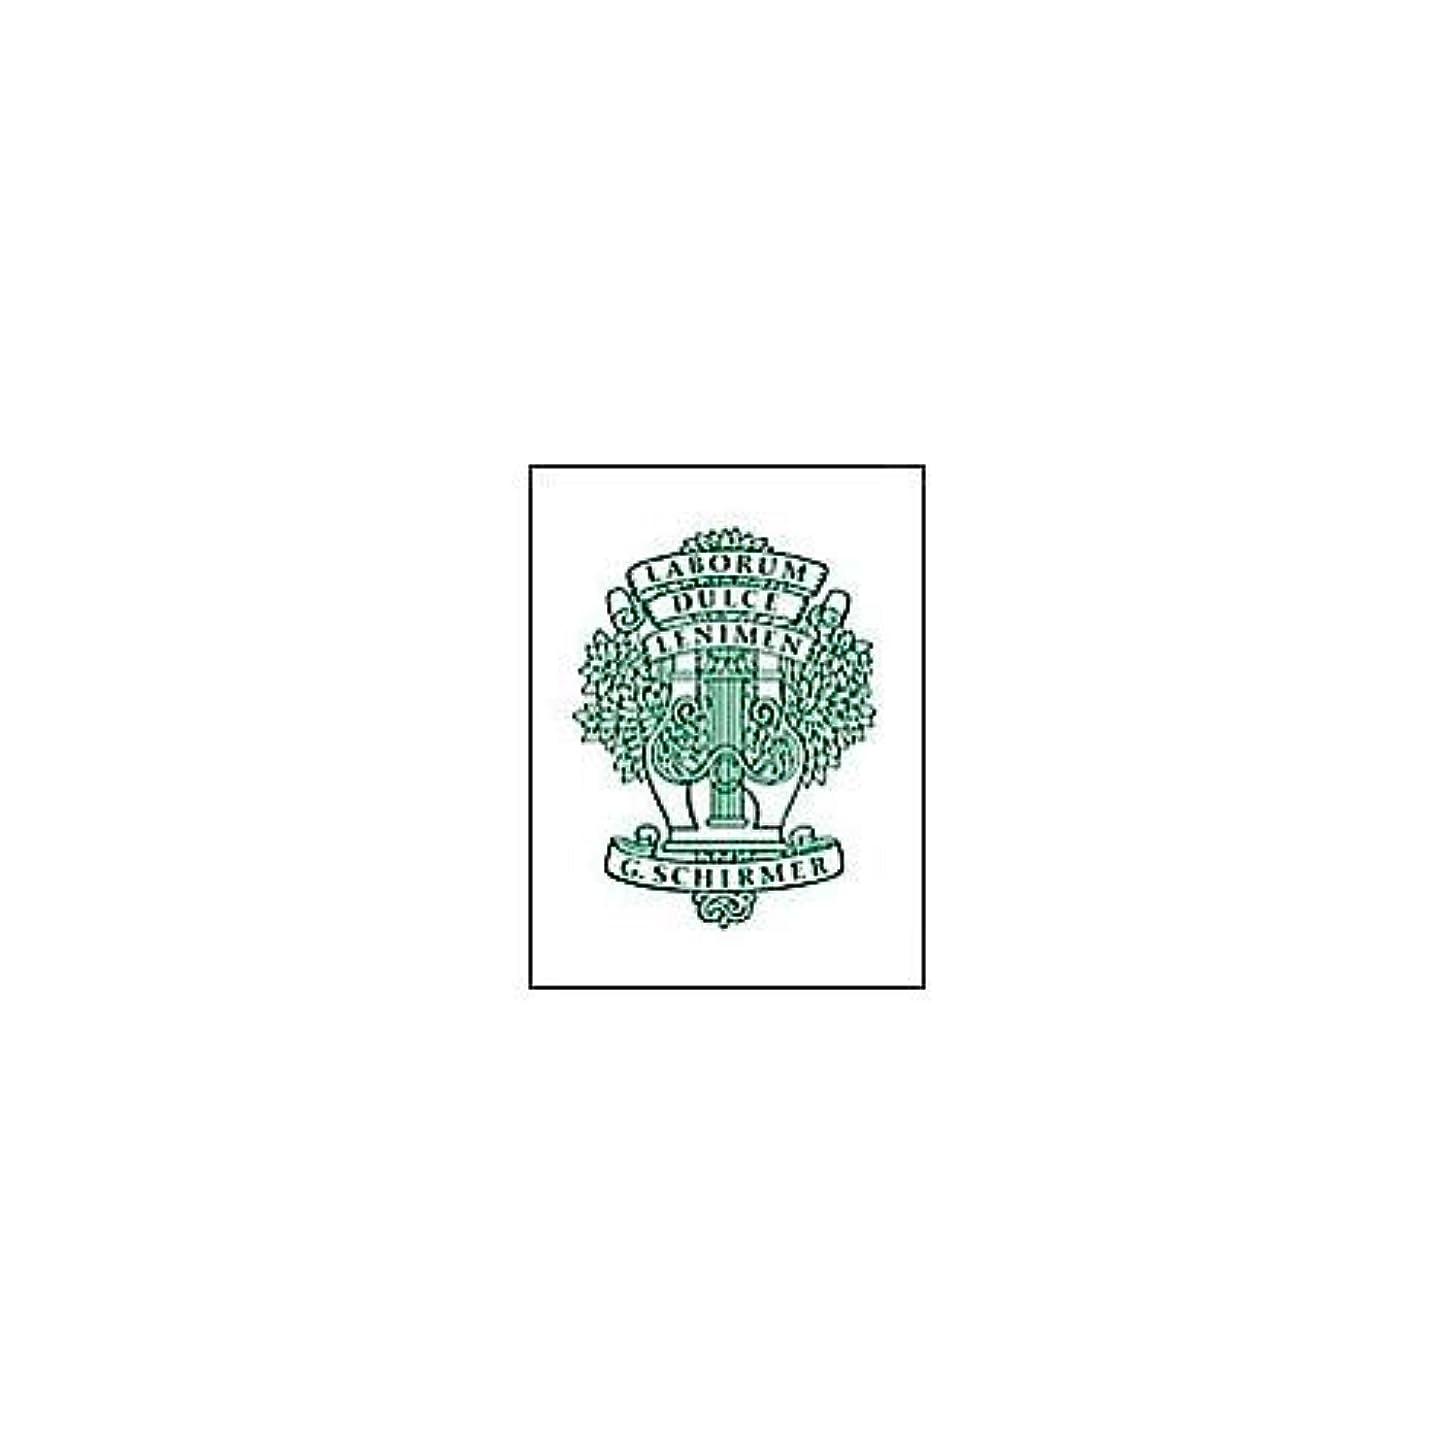 Etudes Op 32 Book 1 Violin Twenty Etudes In First Position By Sitt Pack of 3